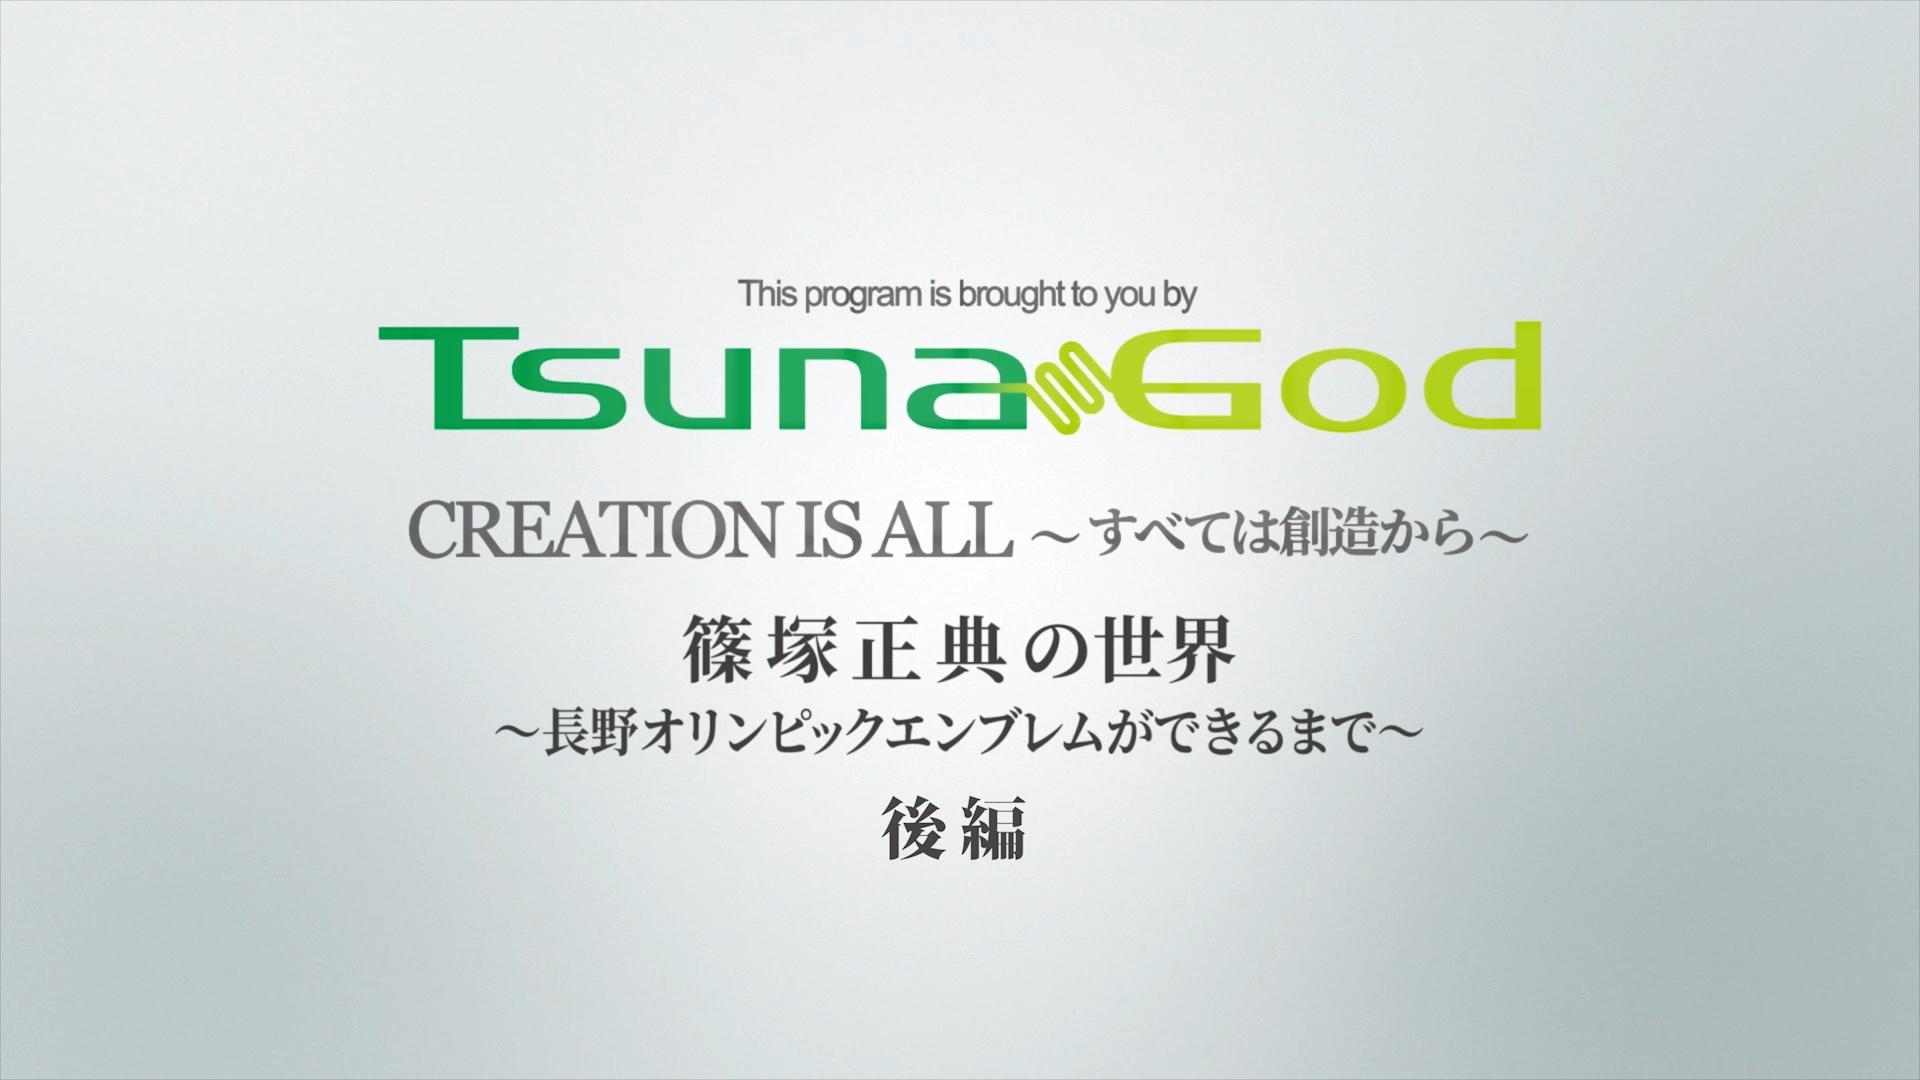 CREATION IS ALL~すべては創造から~  篠塚正典の世界 長野オリンピックエンブレムができるまで (後編)